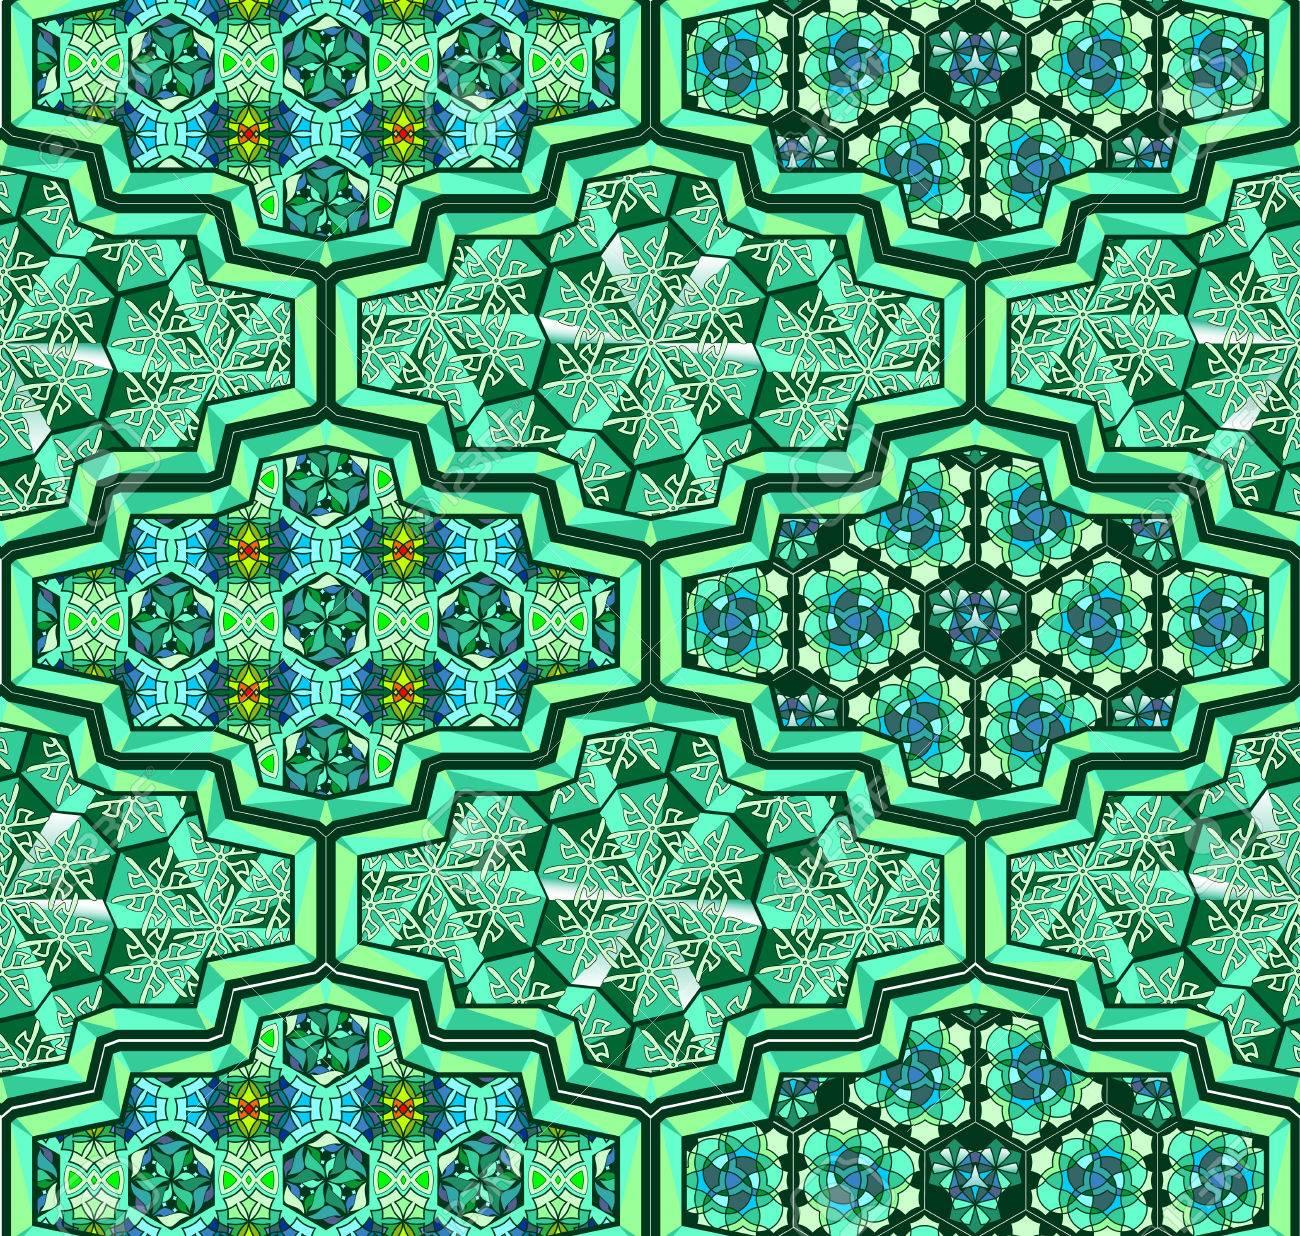 Arabic mosque saint ornamental tiles stylized for Ramadan - 52526624